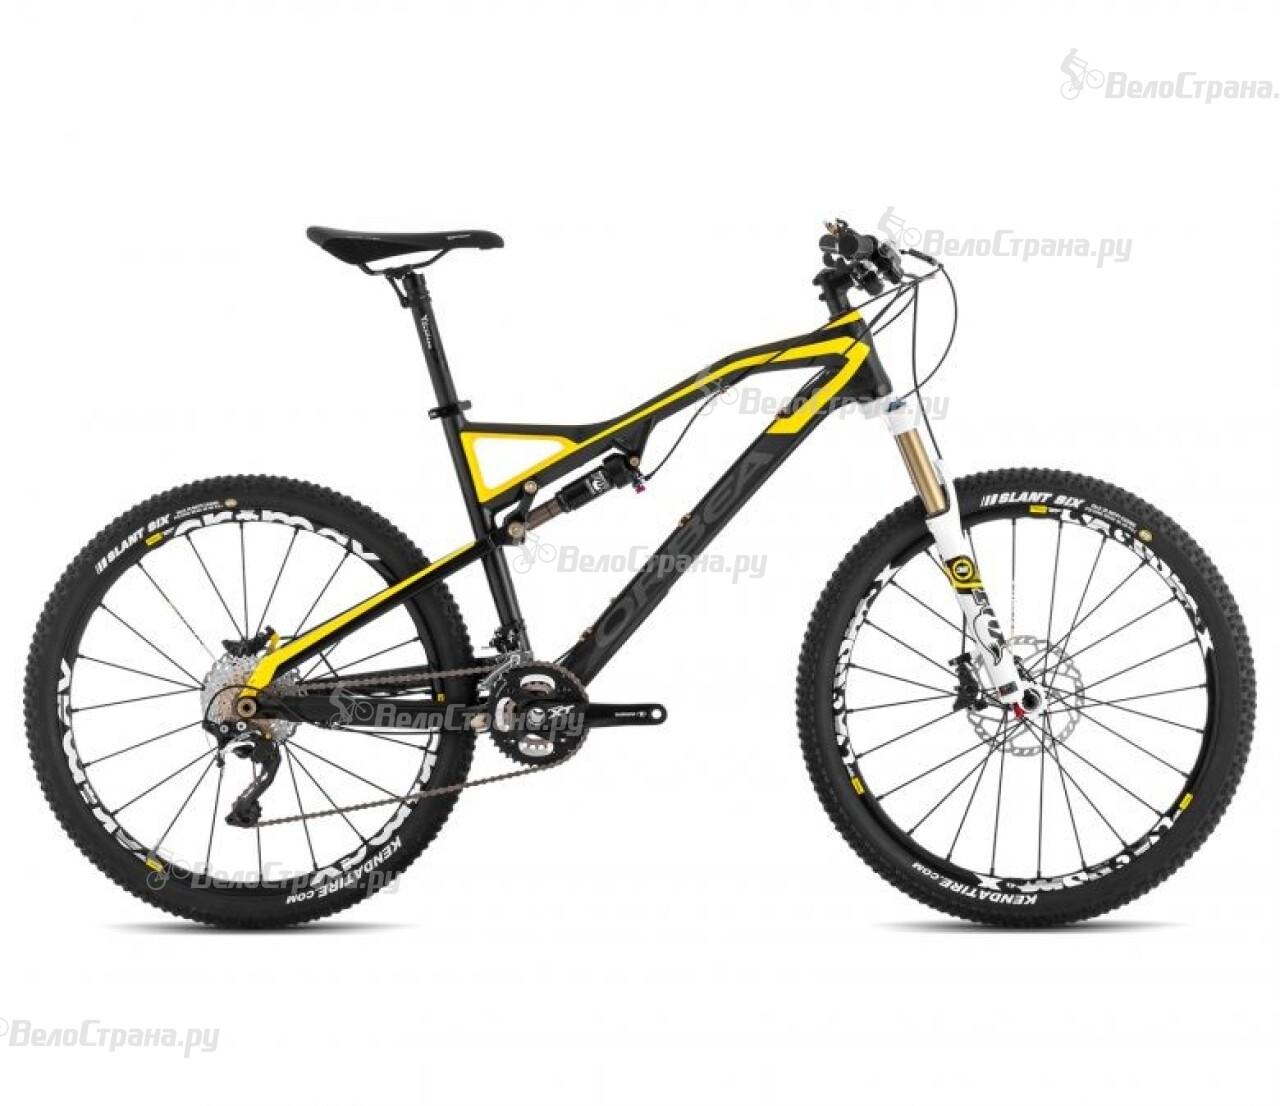 Велосипед Orbea Occam M30 (2014)